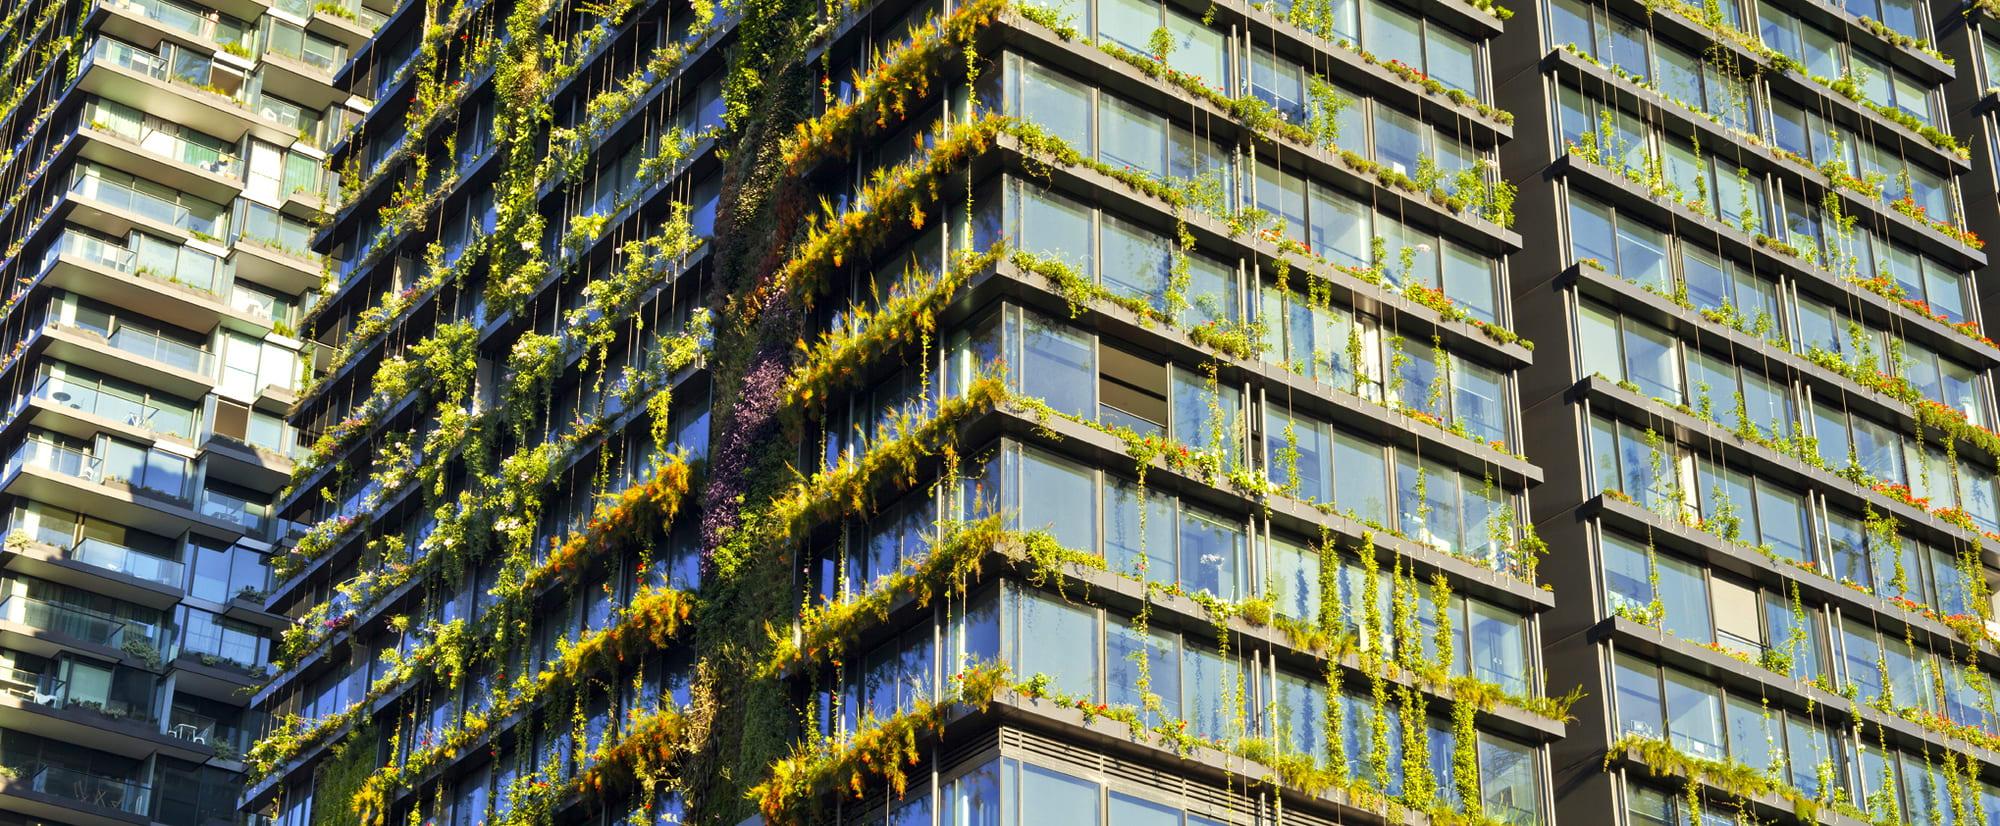 5 new Sustainable Apartment Developments in Australia 2019